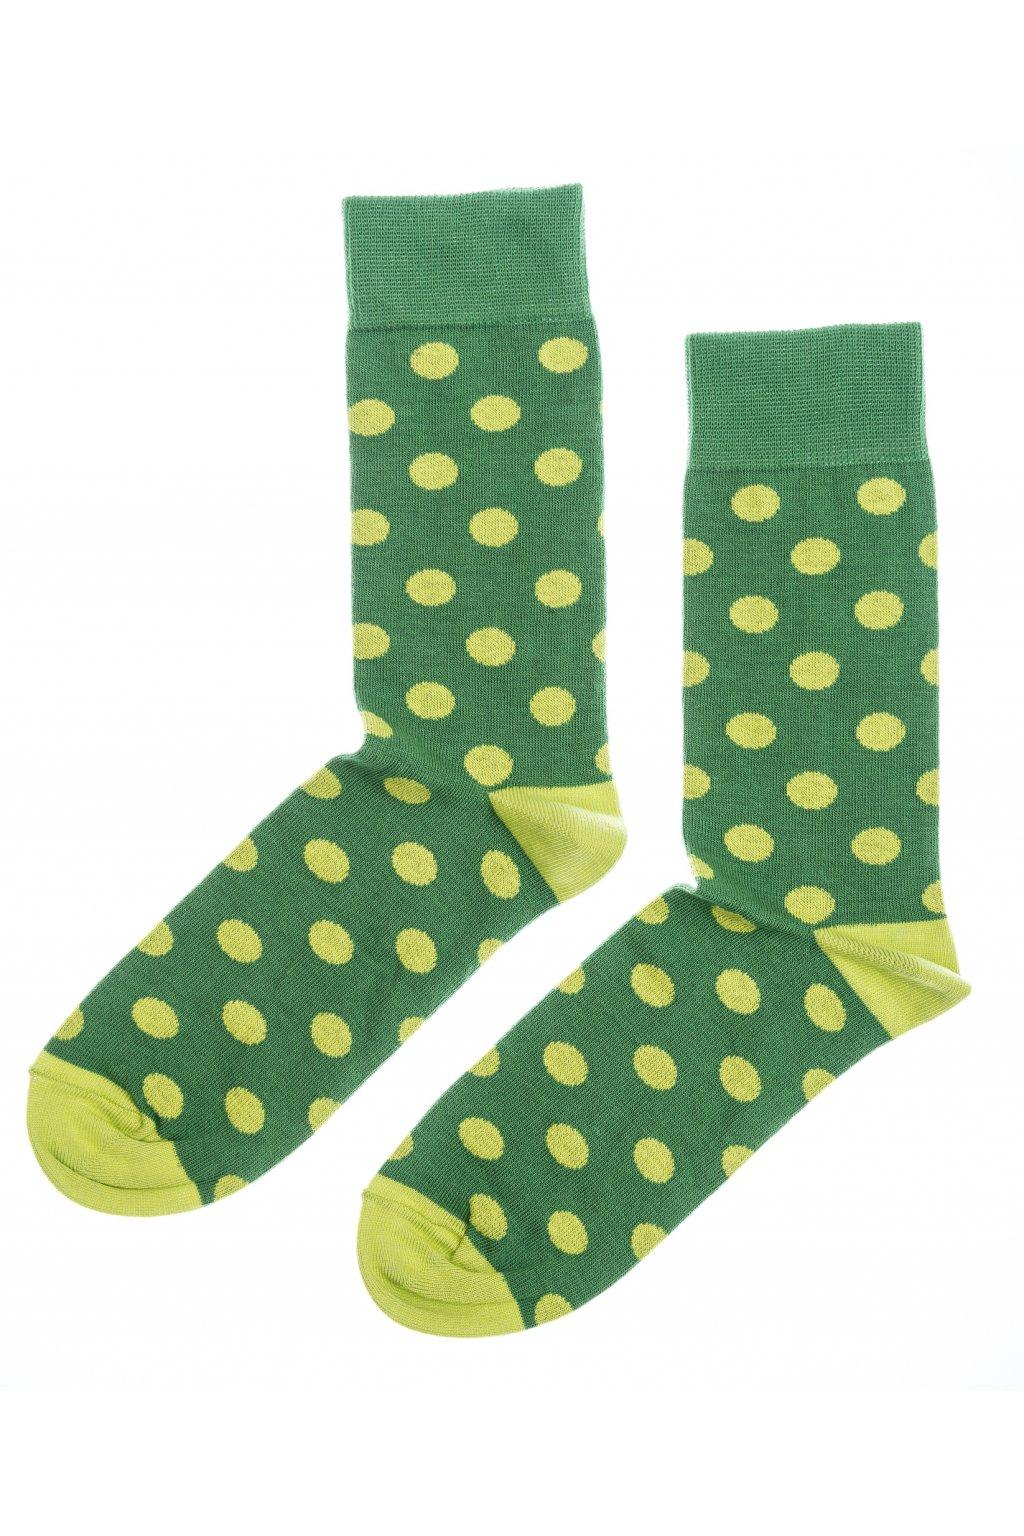 Barevné ponožky Nixon - zelené puntíky